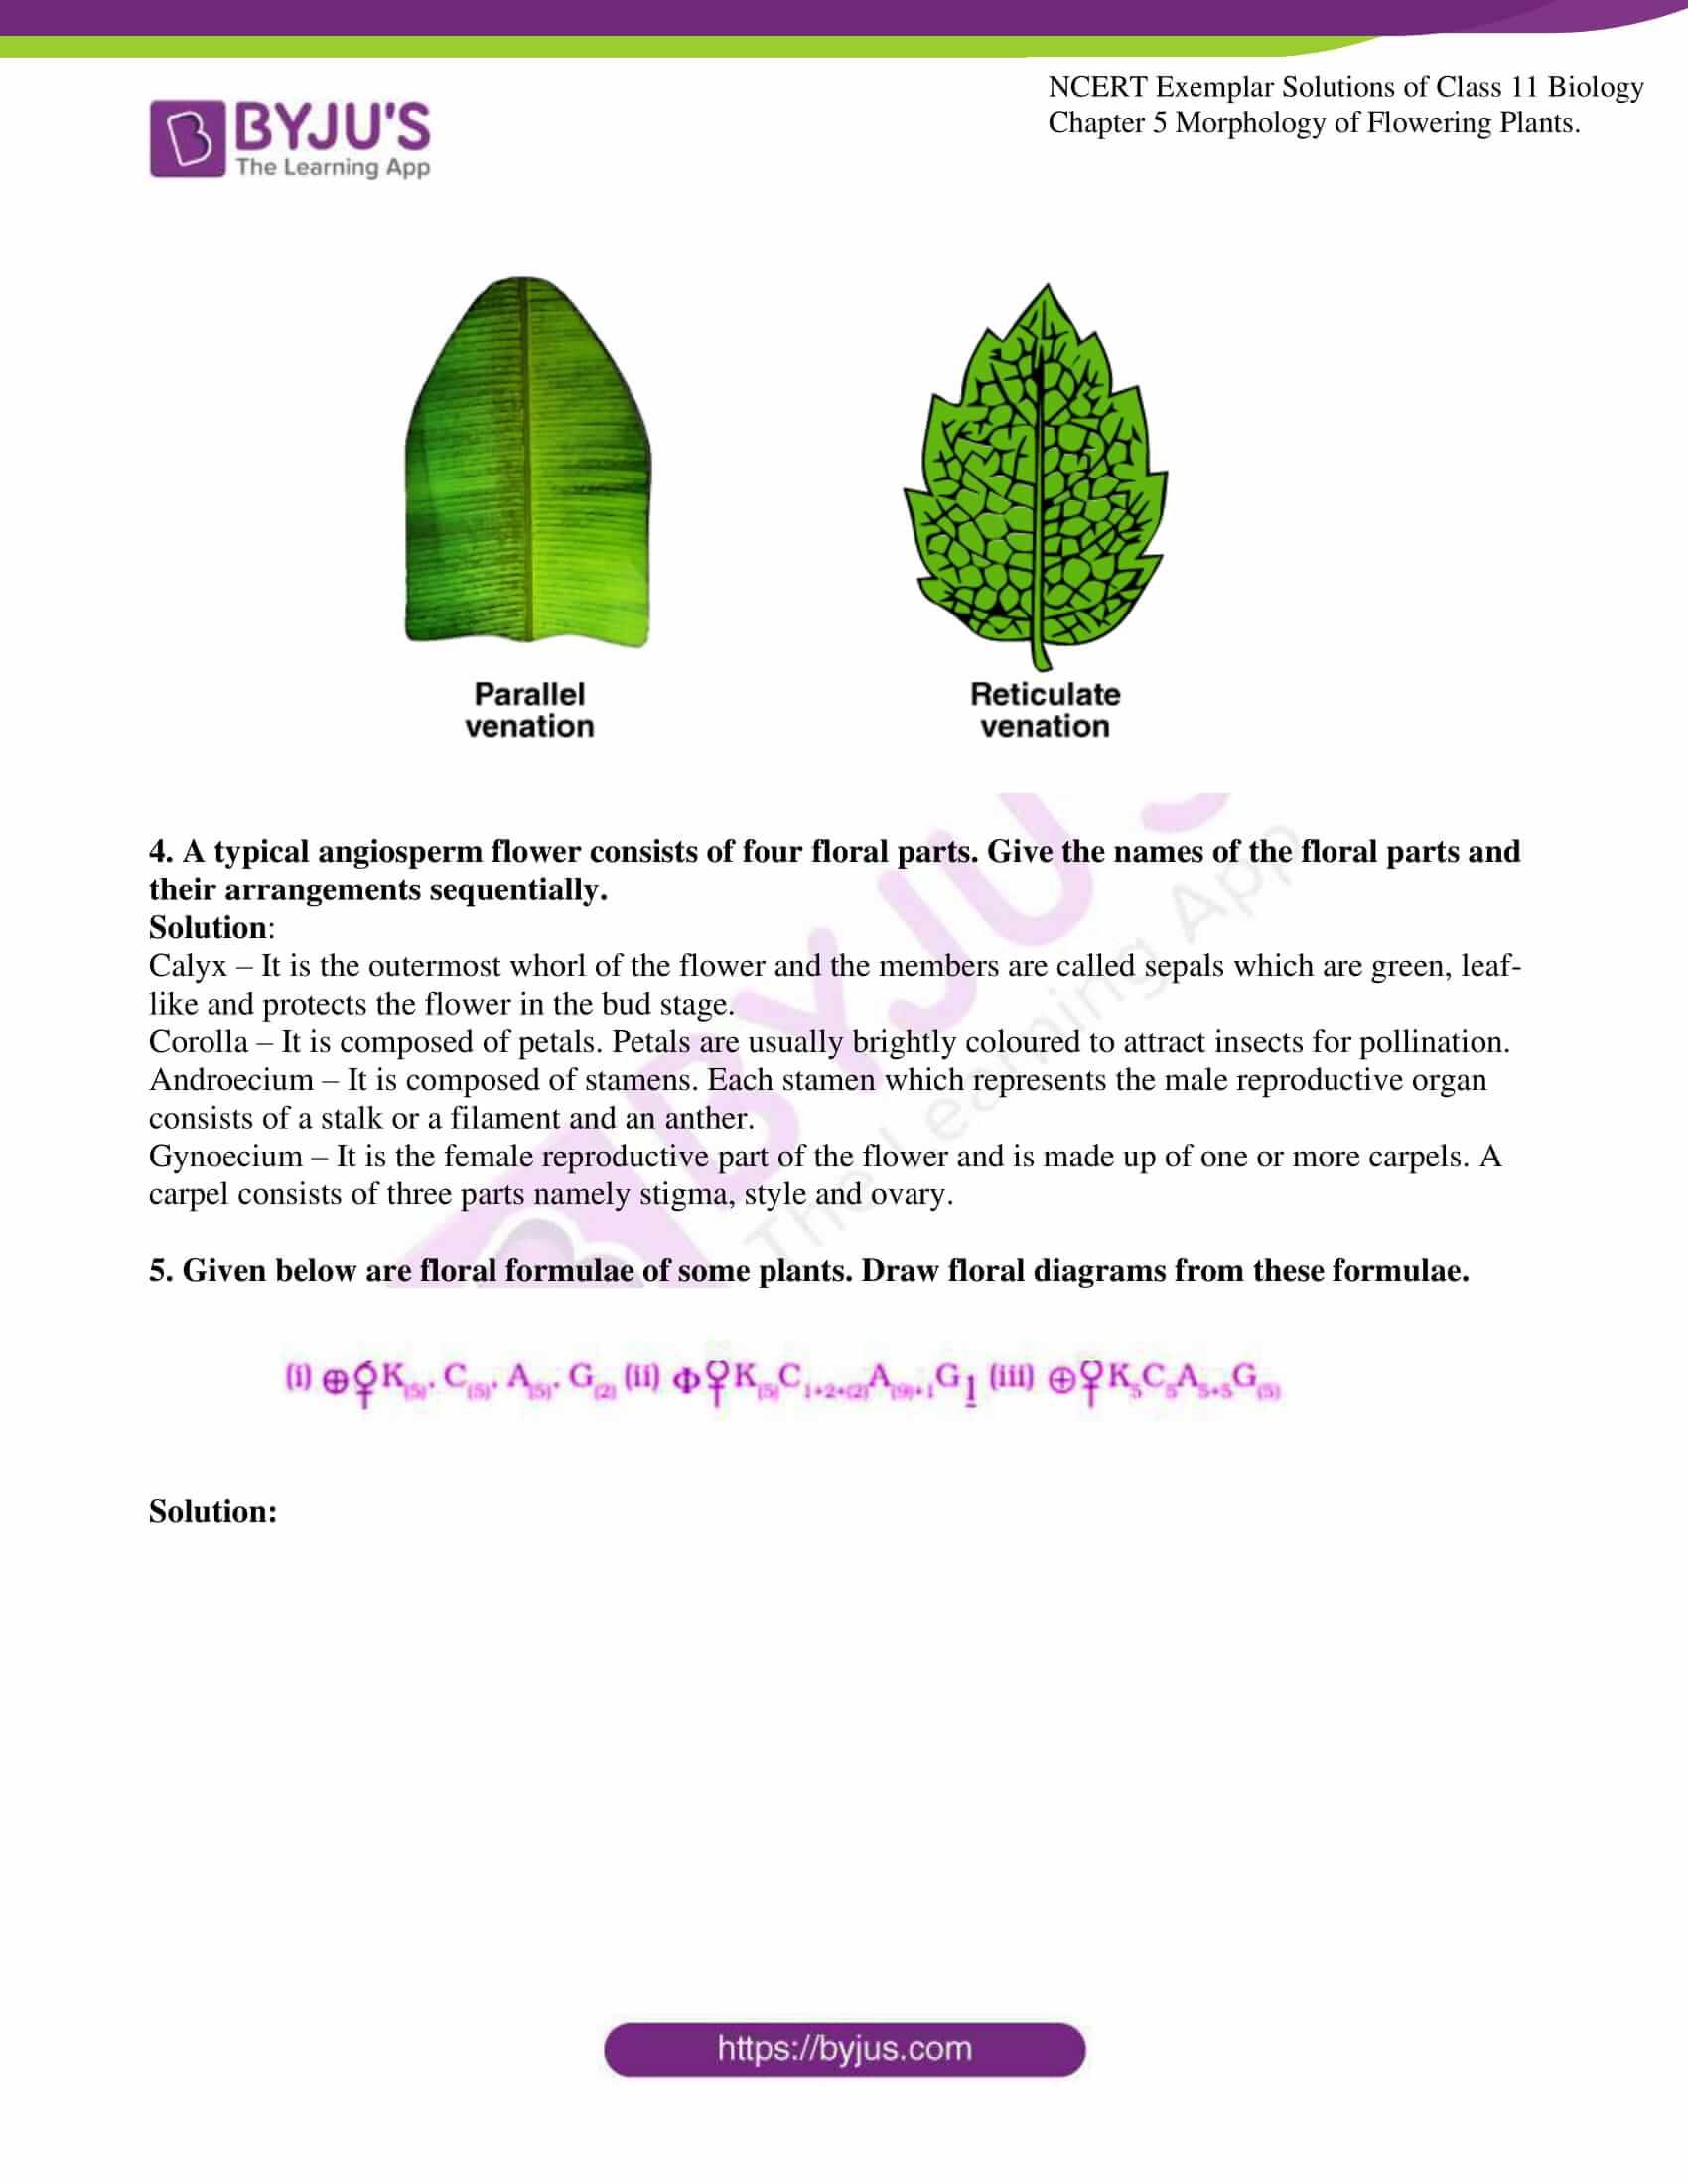 ncert exemplar solutions for class 11 bio chapter 5 06